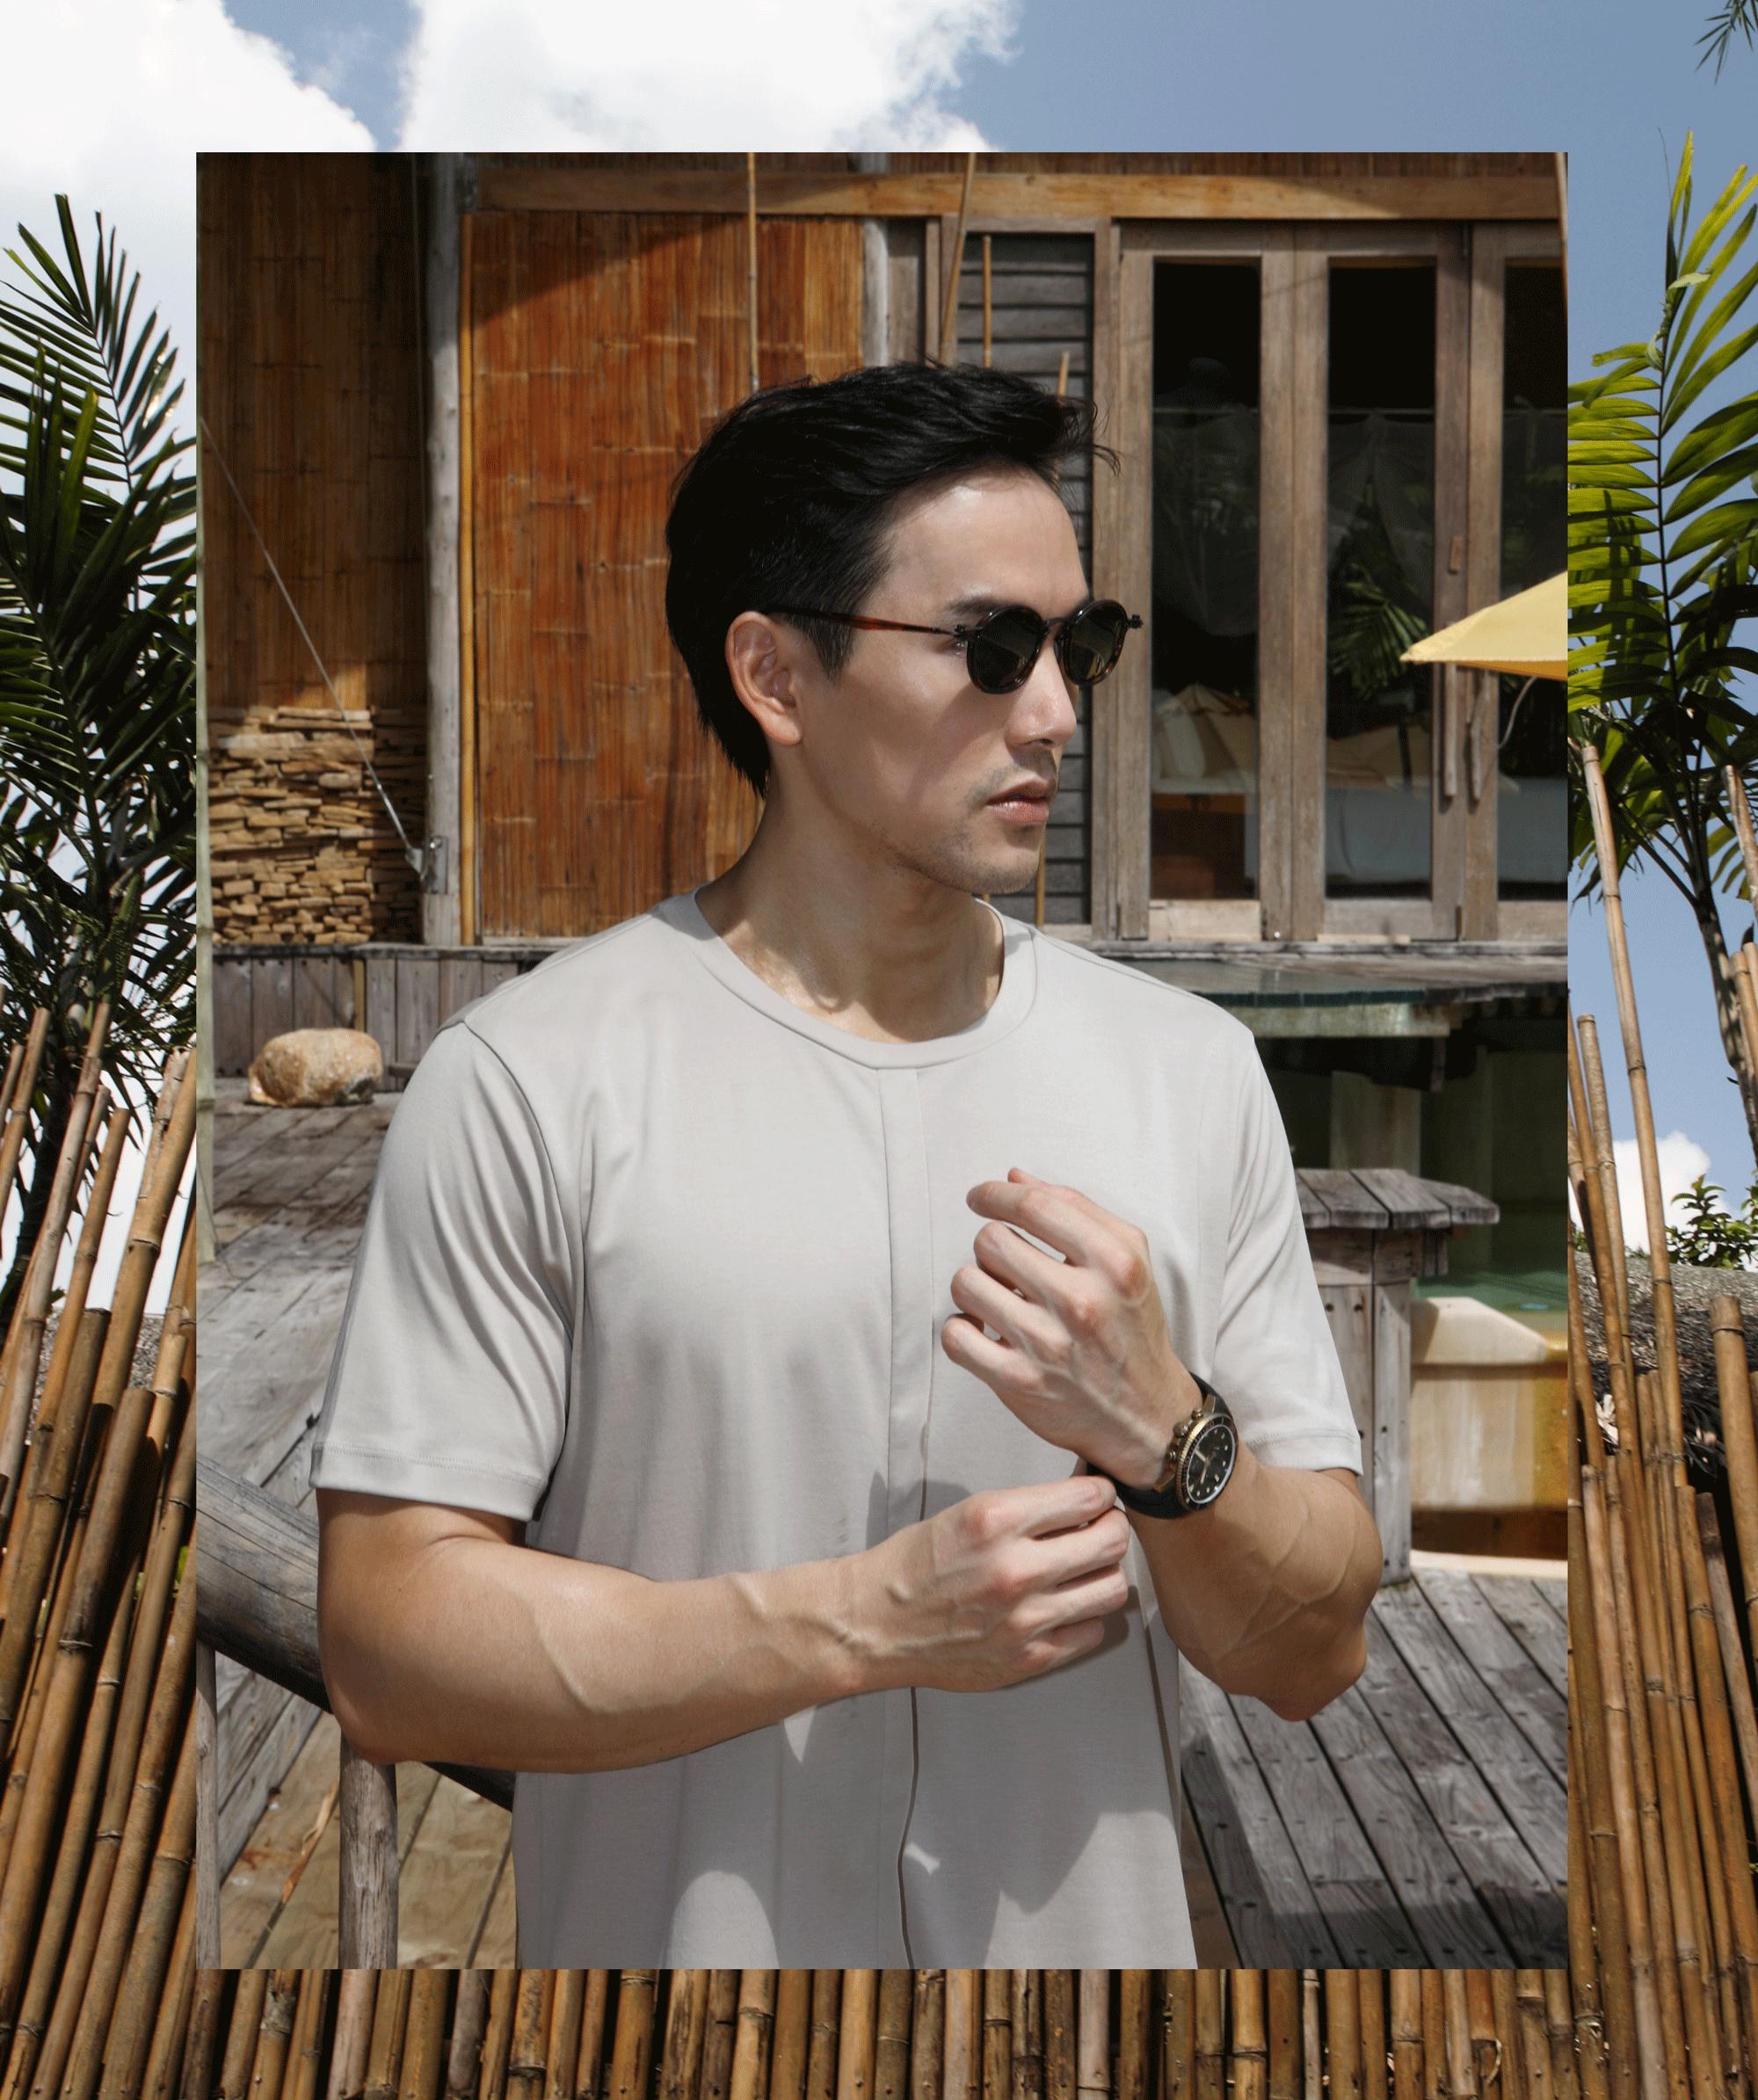 clothes : BLAACK by G2000  watch : TISSOT Seastar 1000 Chronograph  sunglasses : TAVAT